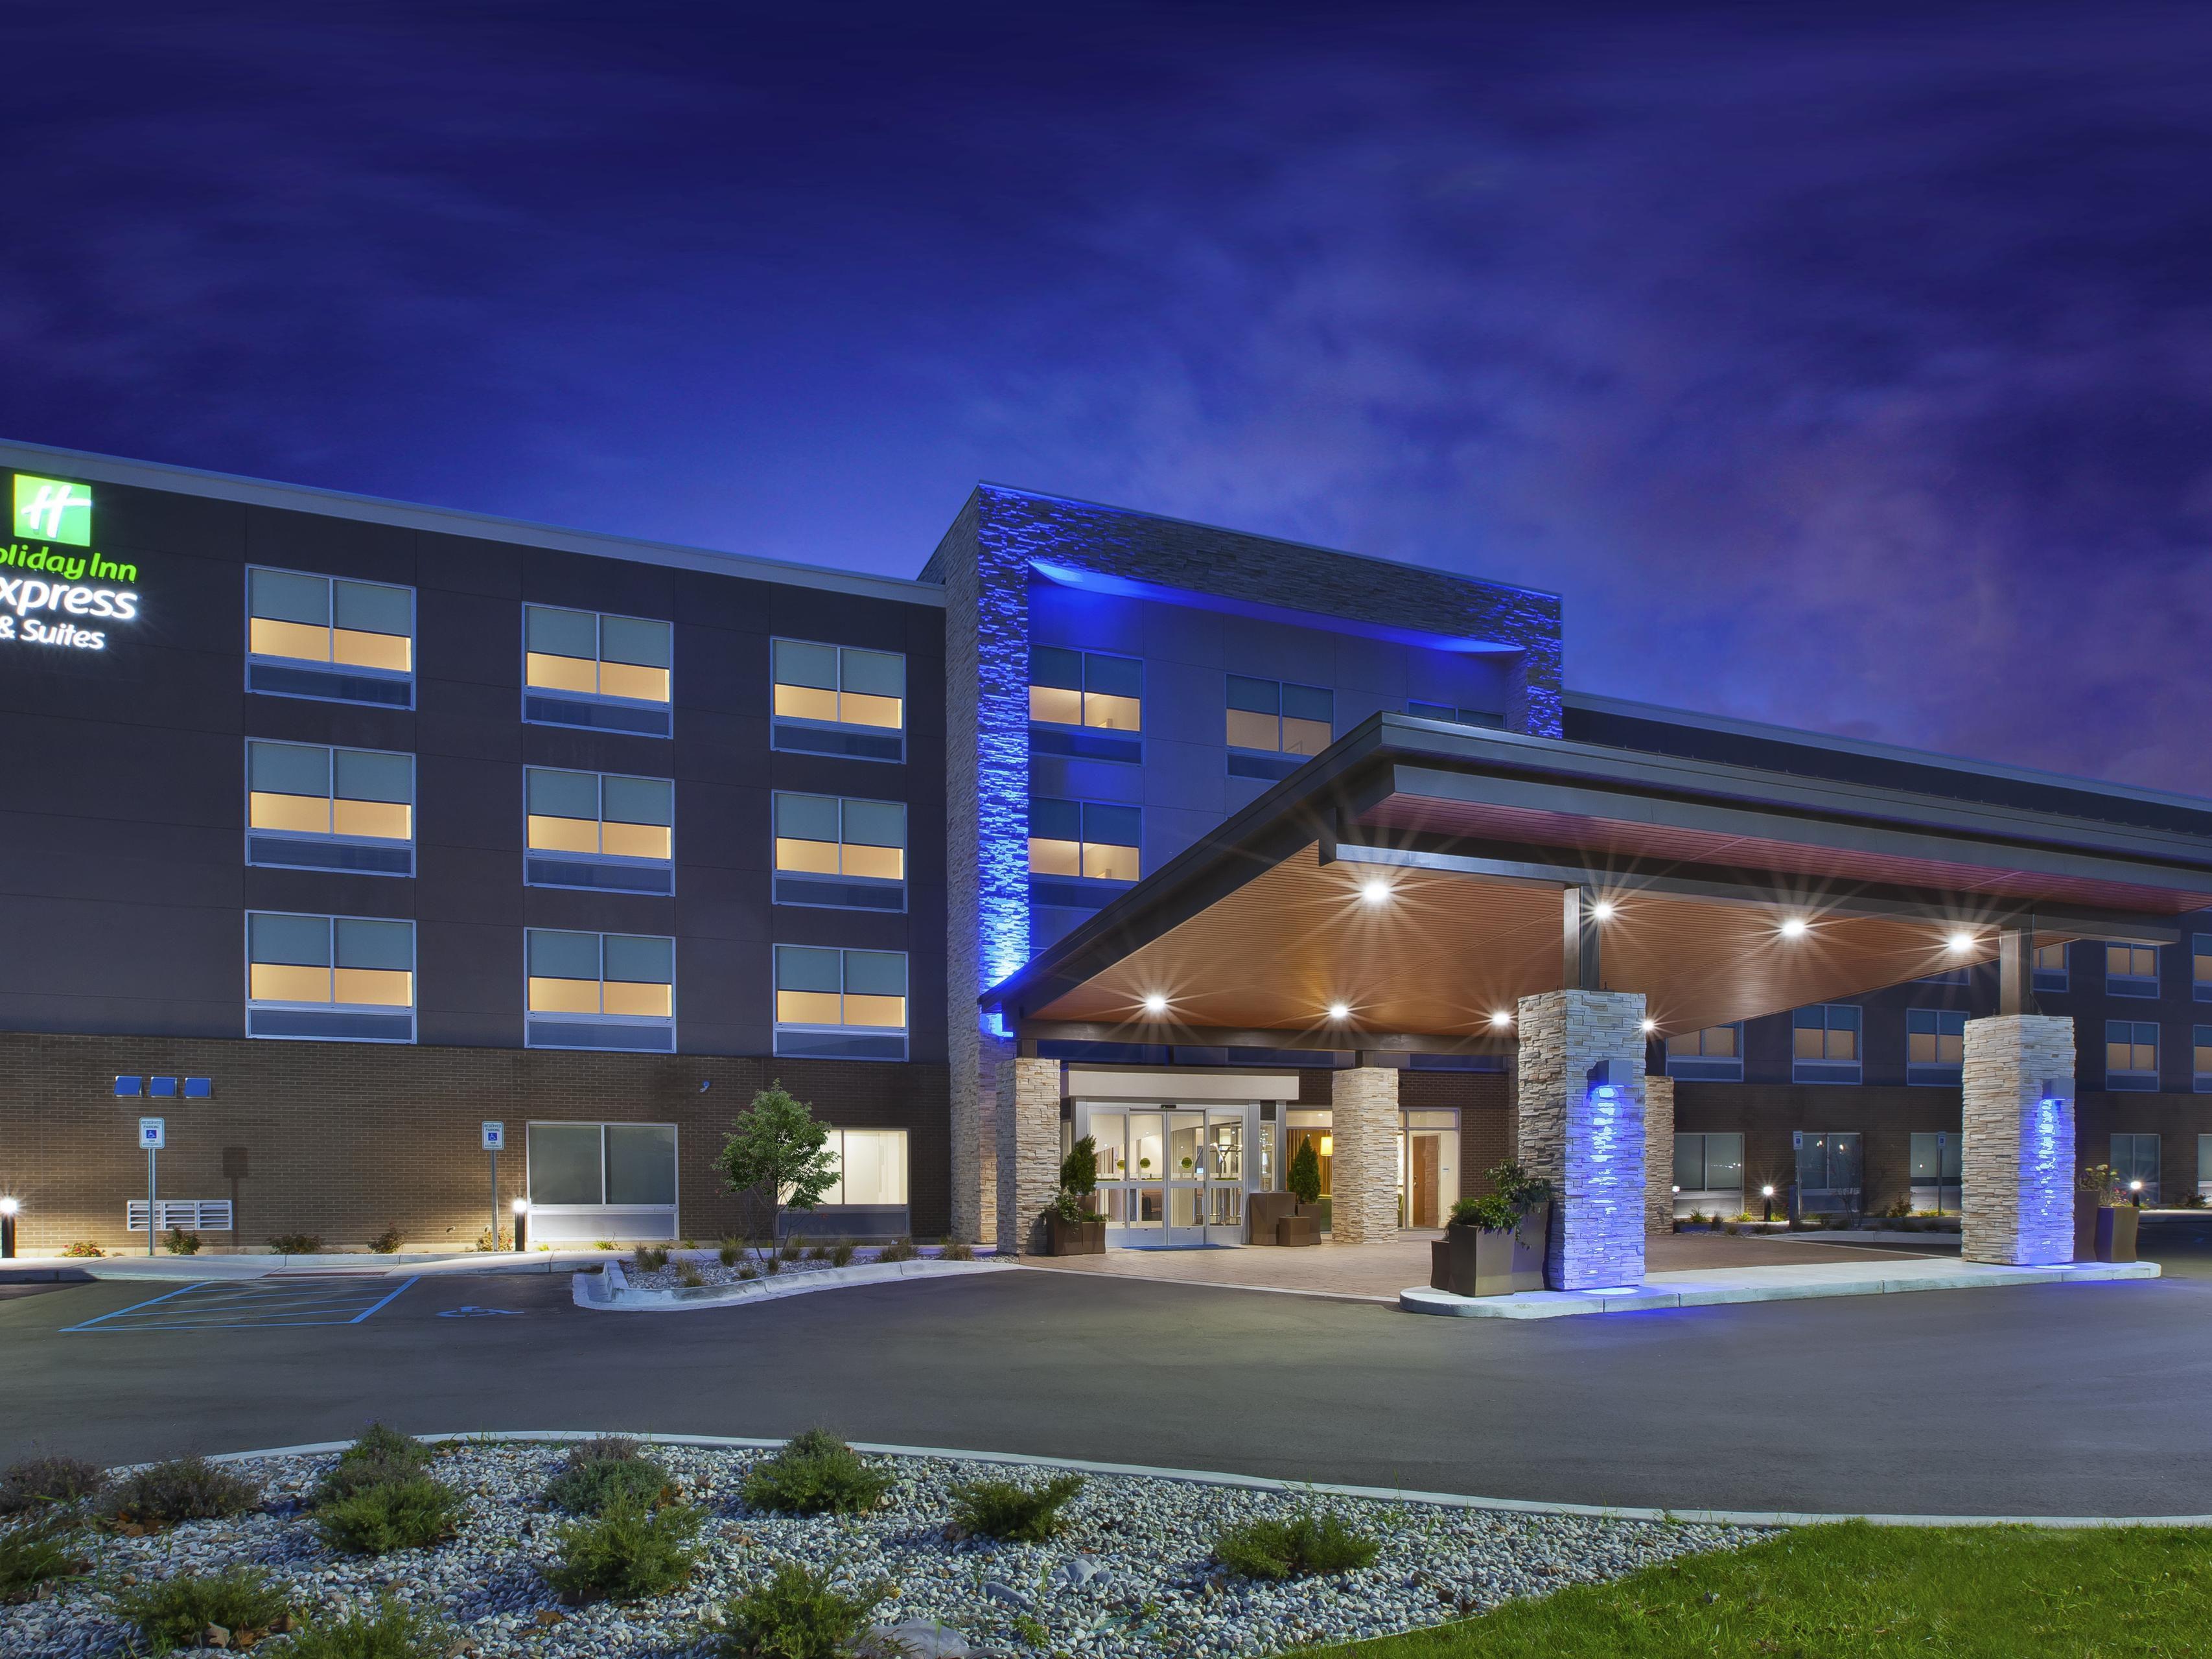 Enjoyable Holiday Inn Express Walker Hotels Budget Hotels In Walker Download Free Architecture Designs Viewormadebymaigaardcom